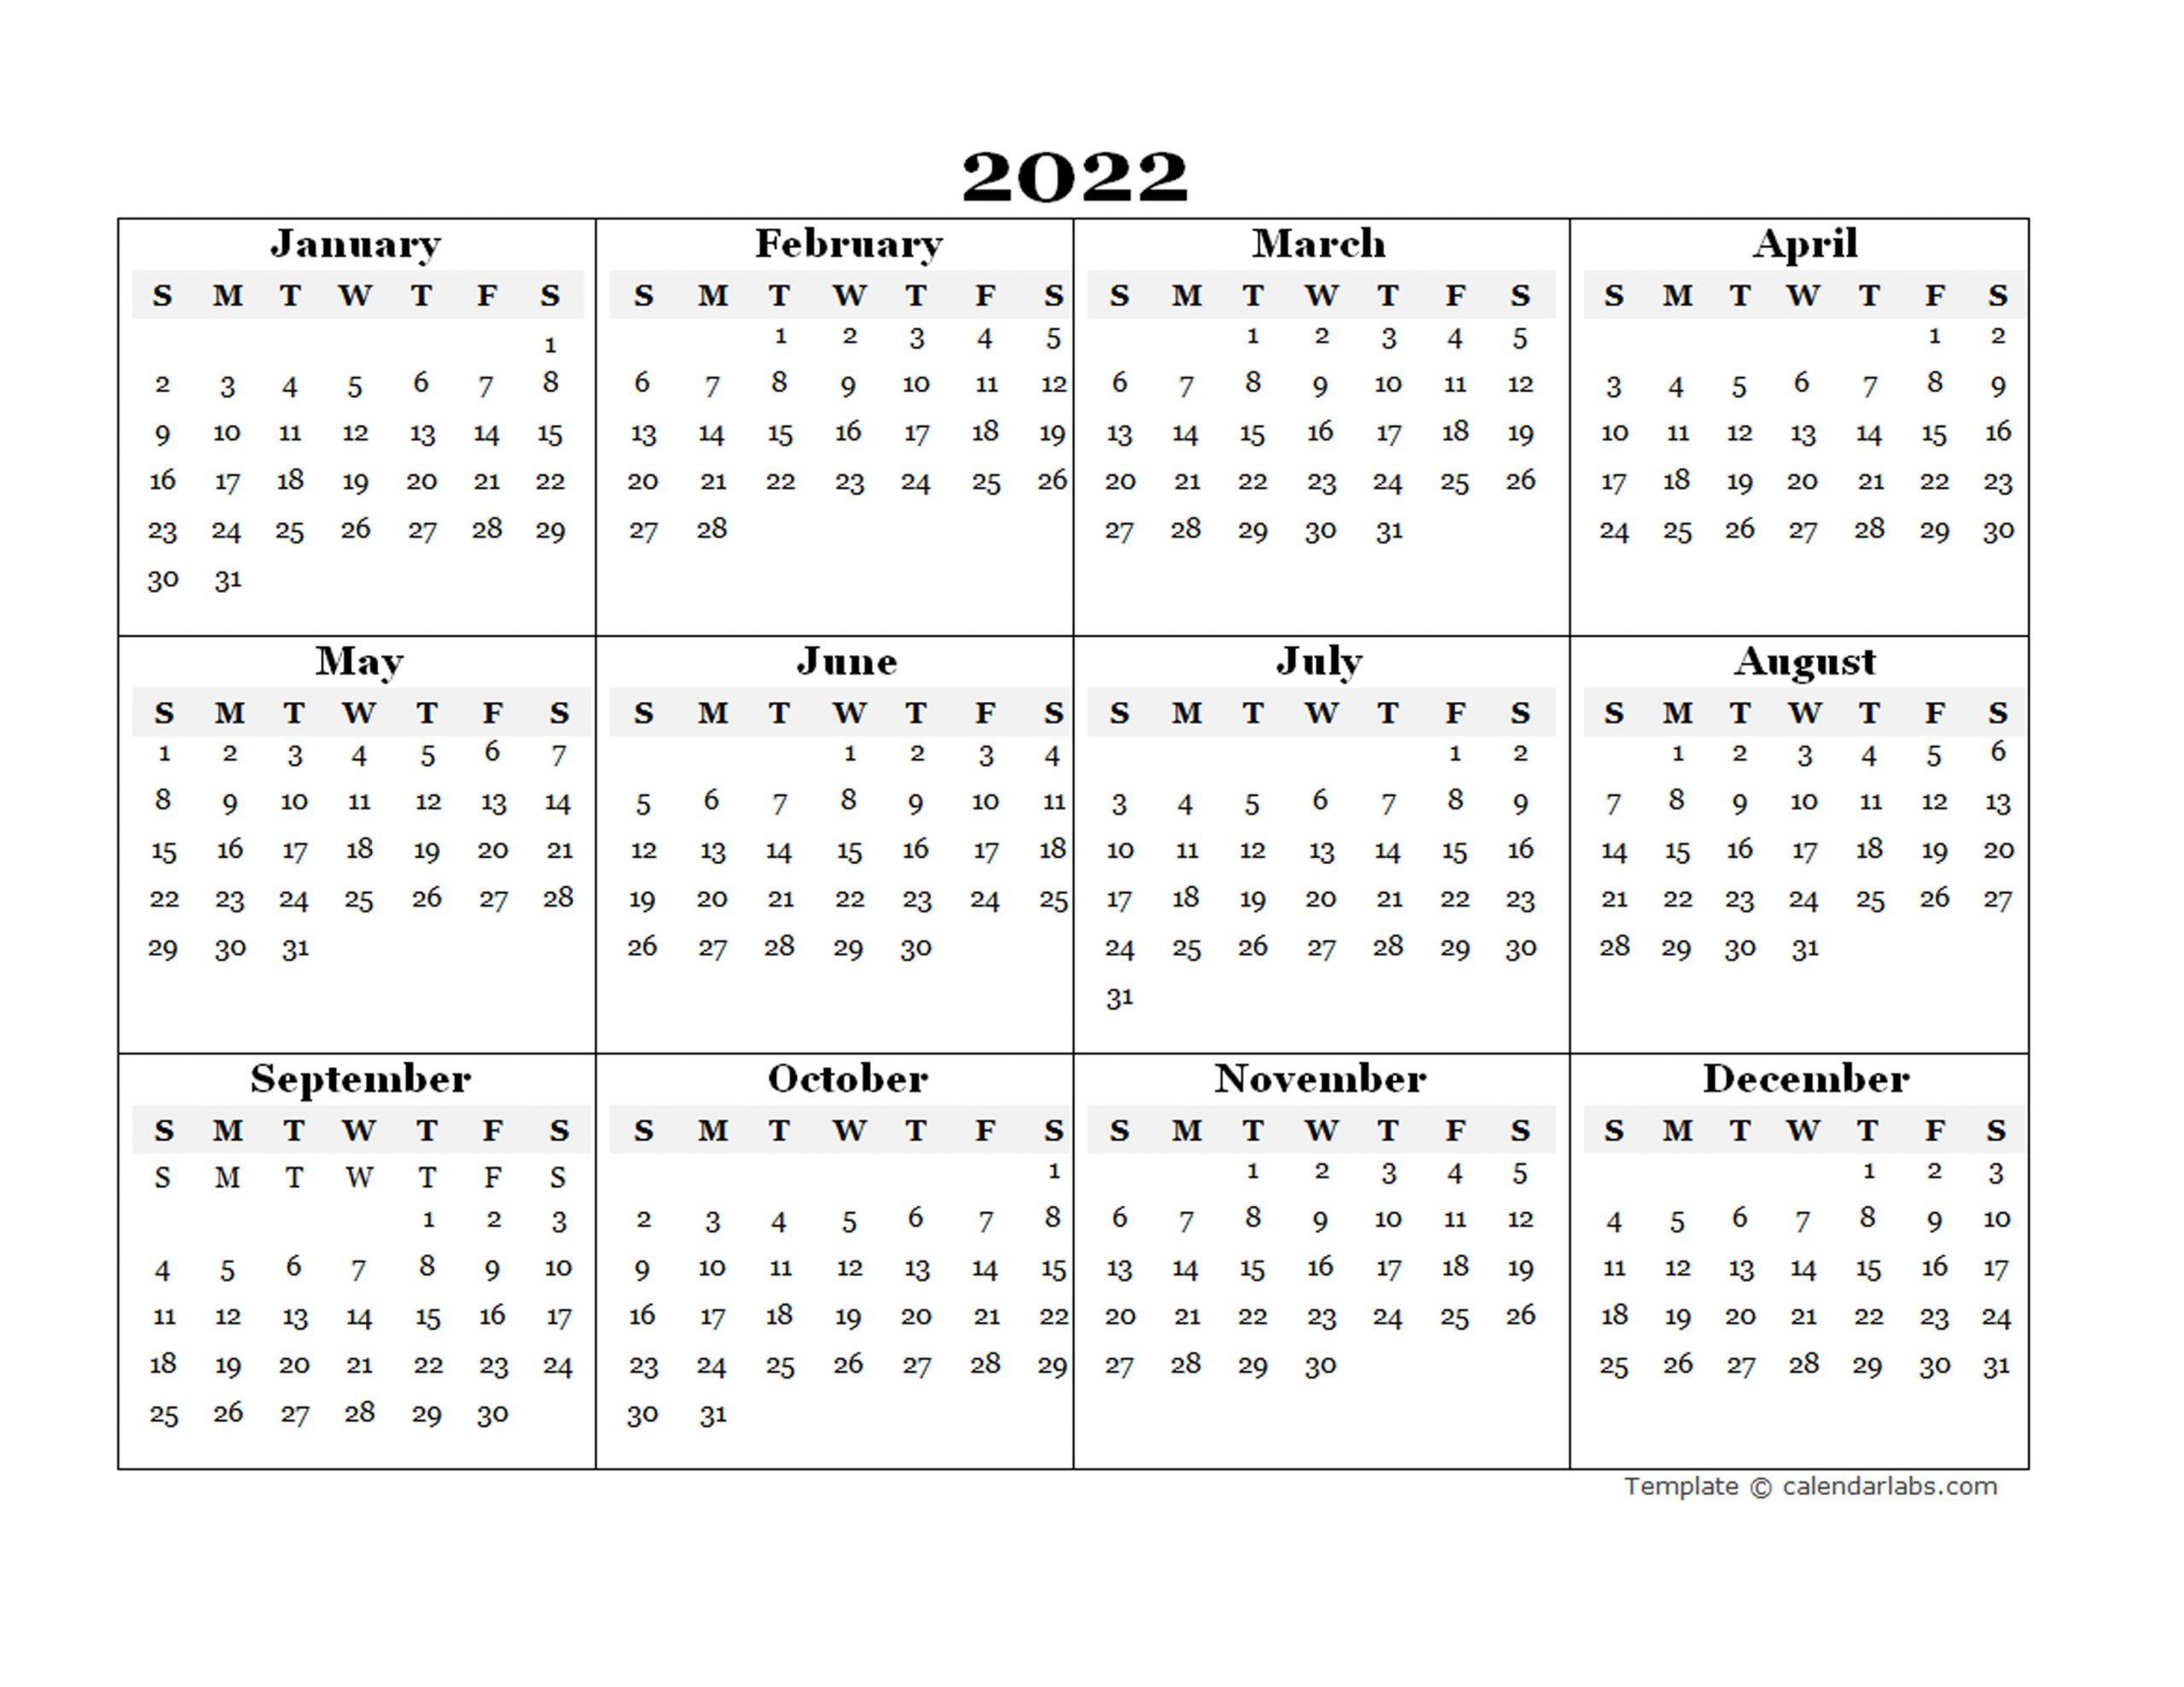 2022 Blank Yearly Calendar Template - Free Printable Templates For Julian To Gregorian Calendar 2022